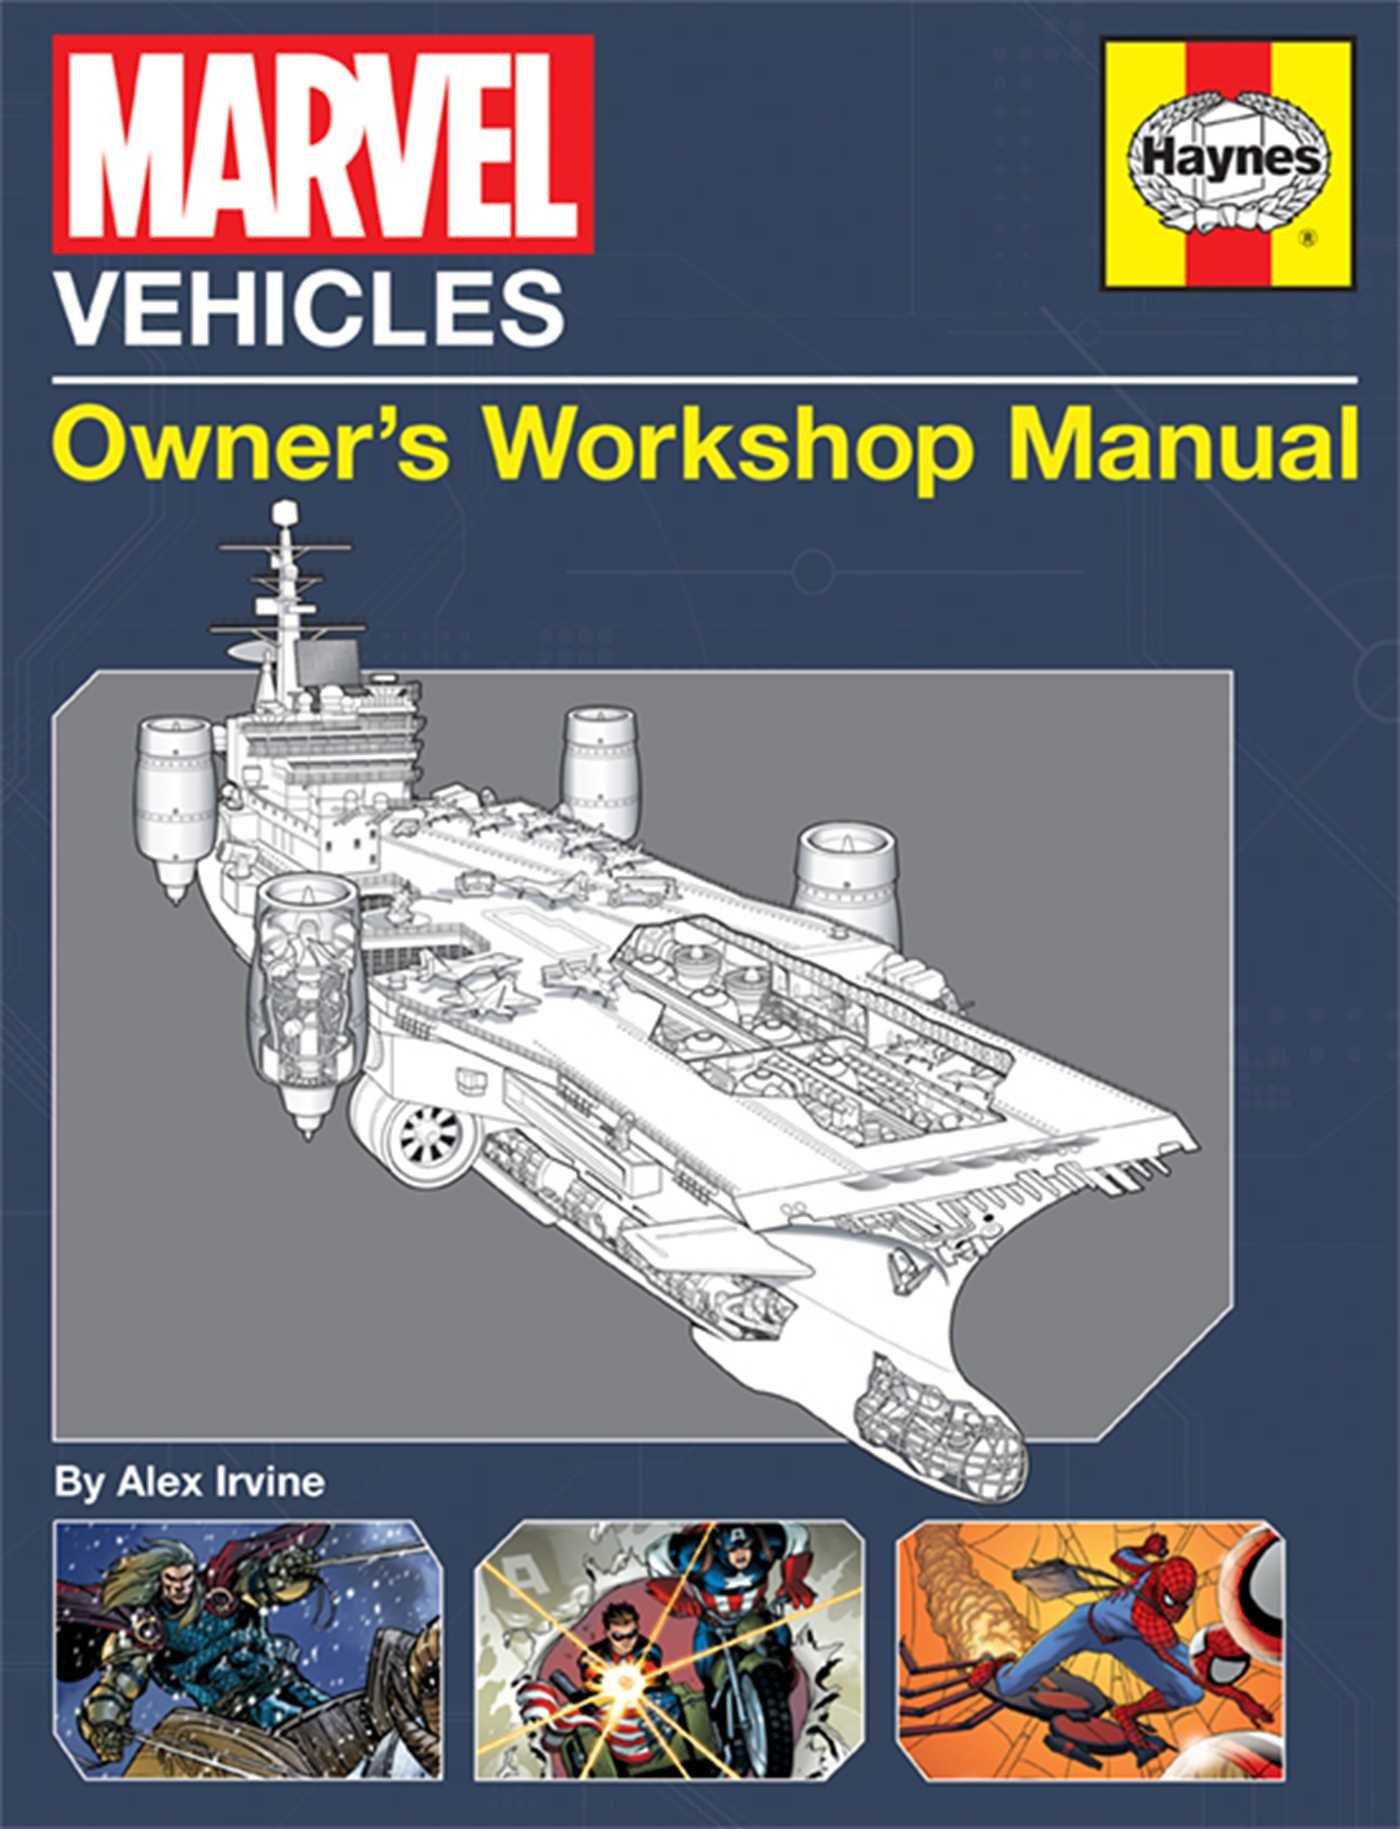 Marvel Vehicles: Owner's Workshop Manual: Alex Irvine: 9781608874286:  Amazon.com: Books